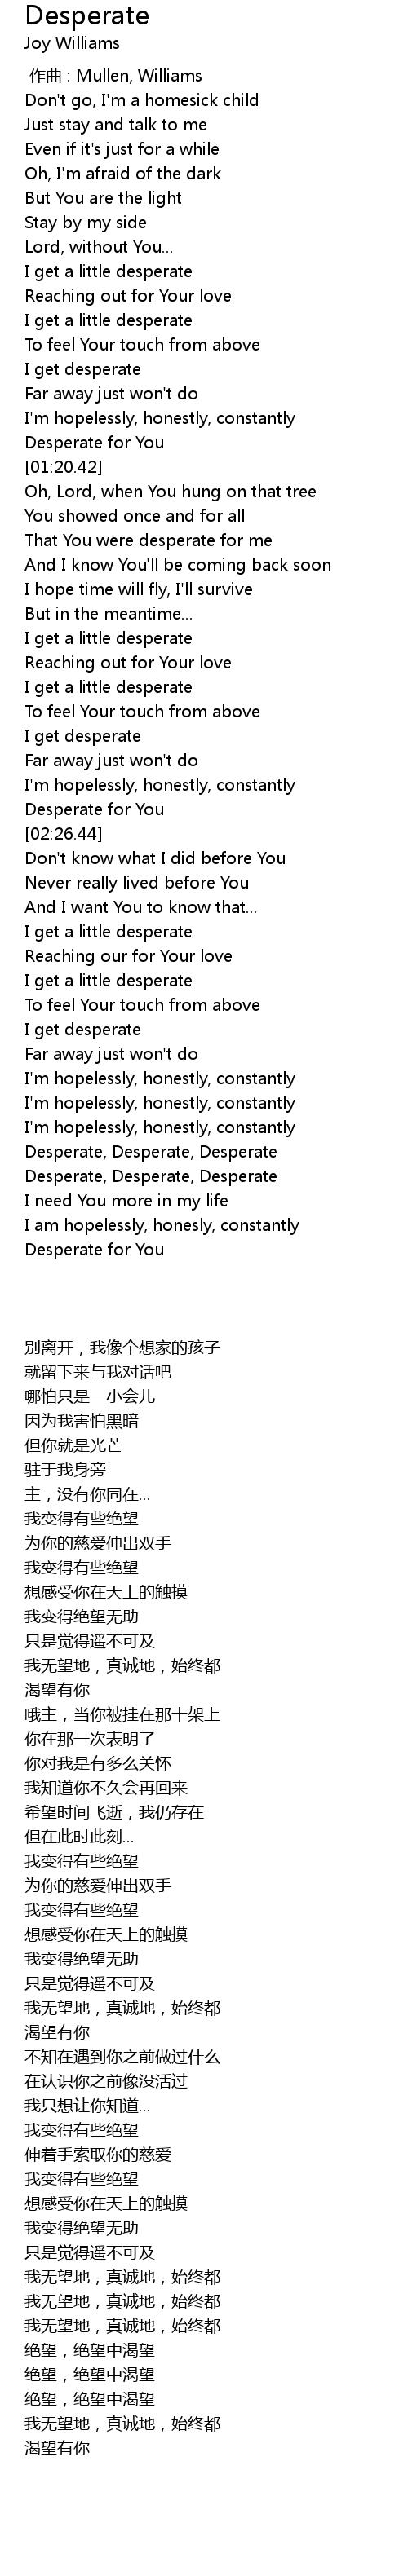 Desperate Lyrics Follow Lyrics Distillers desperate lyrics & video : follow lyrics